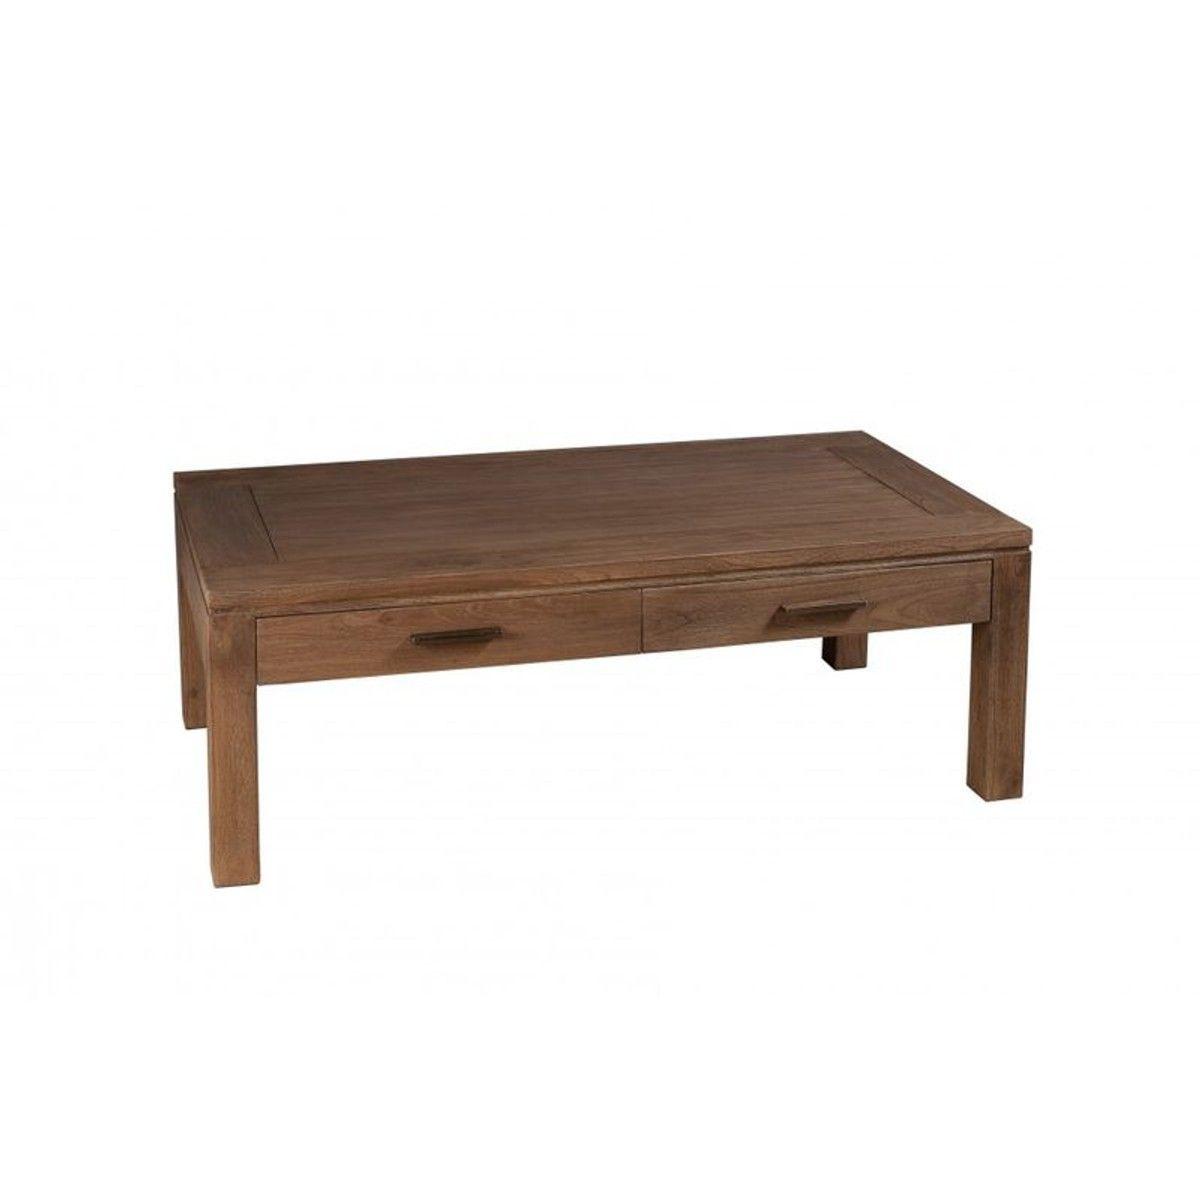 Table Basse Bois Exotique Cannelle 110cm Louna - Taille : TU ...